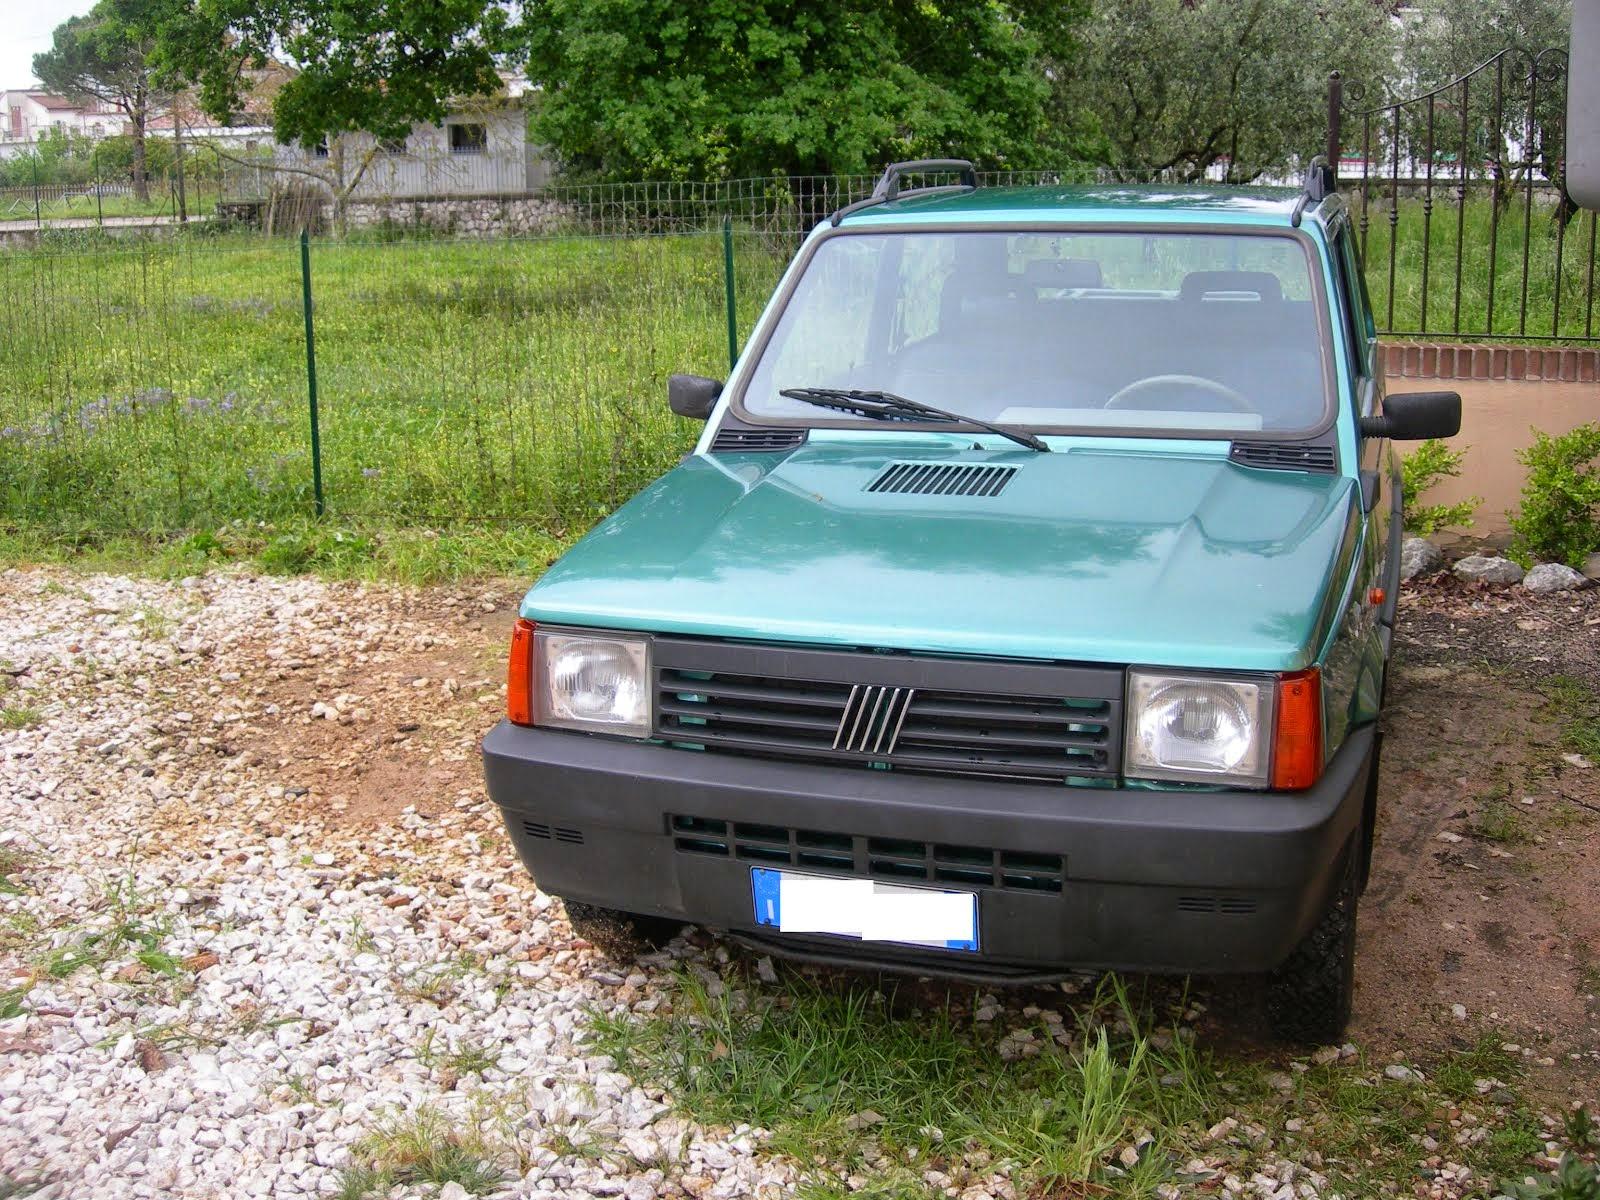 Fiat Panda 1.1 Trekking 4x4 Anno 2001 110.000km